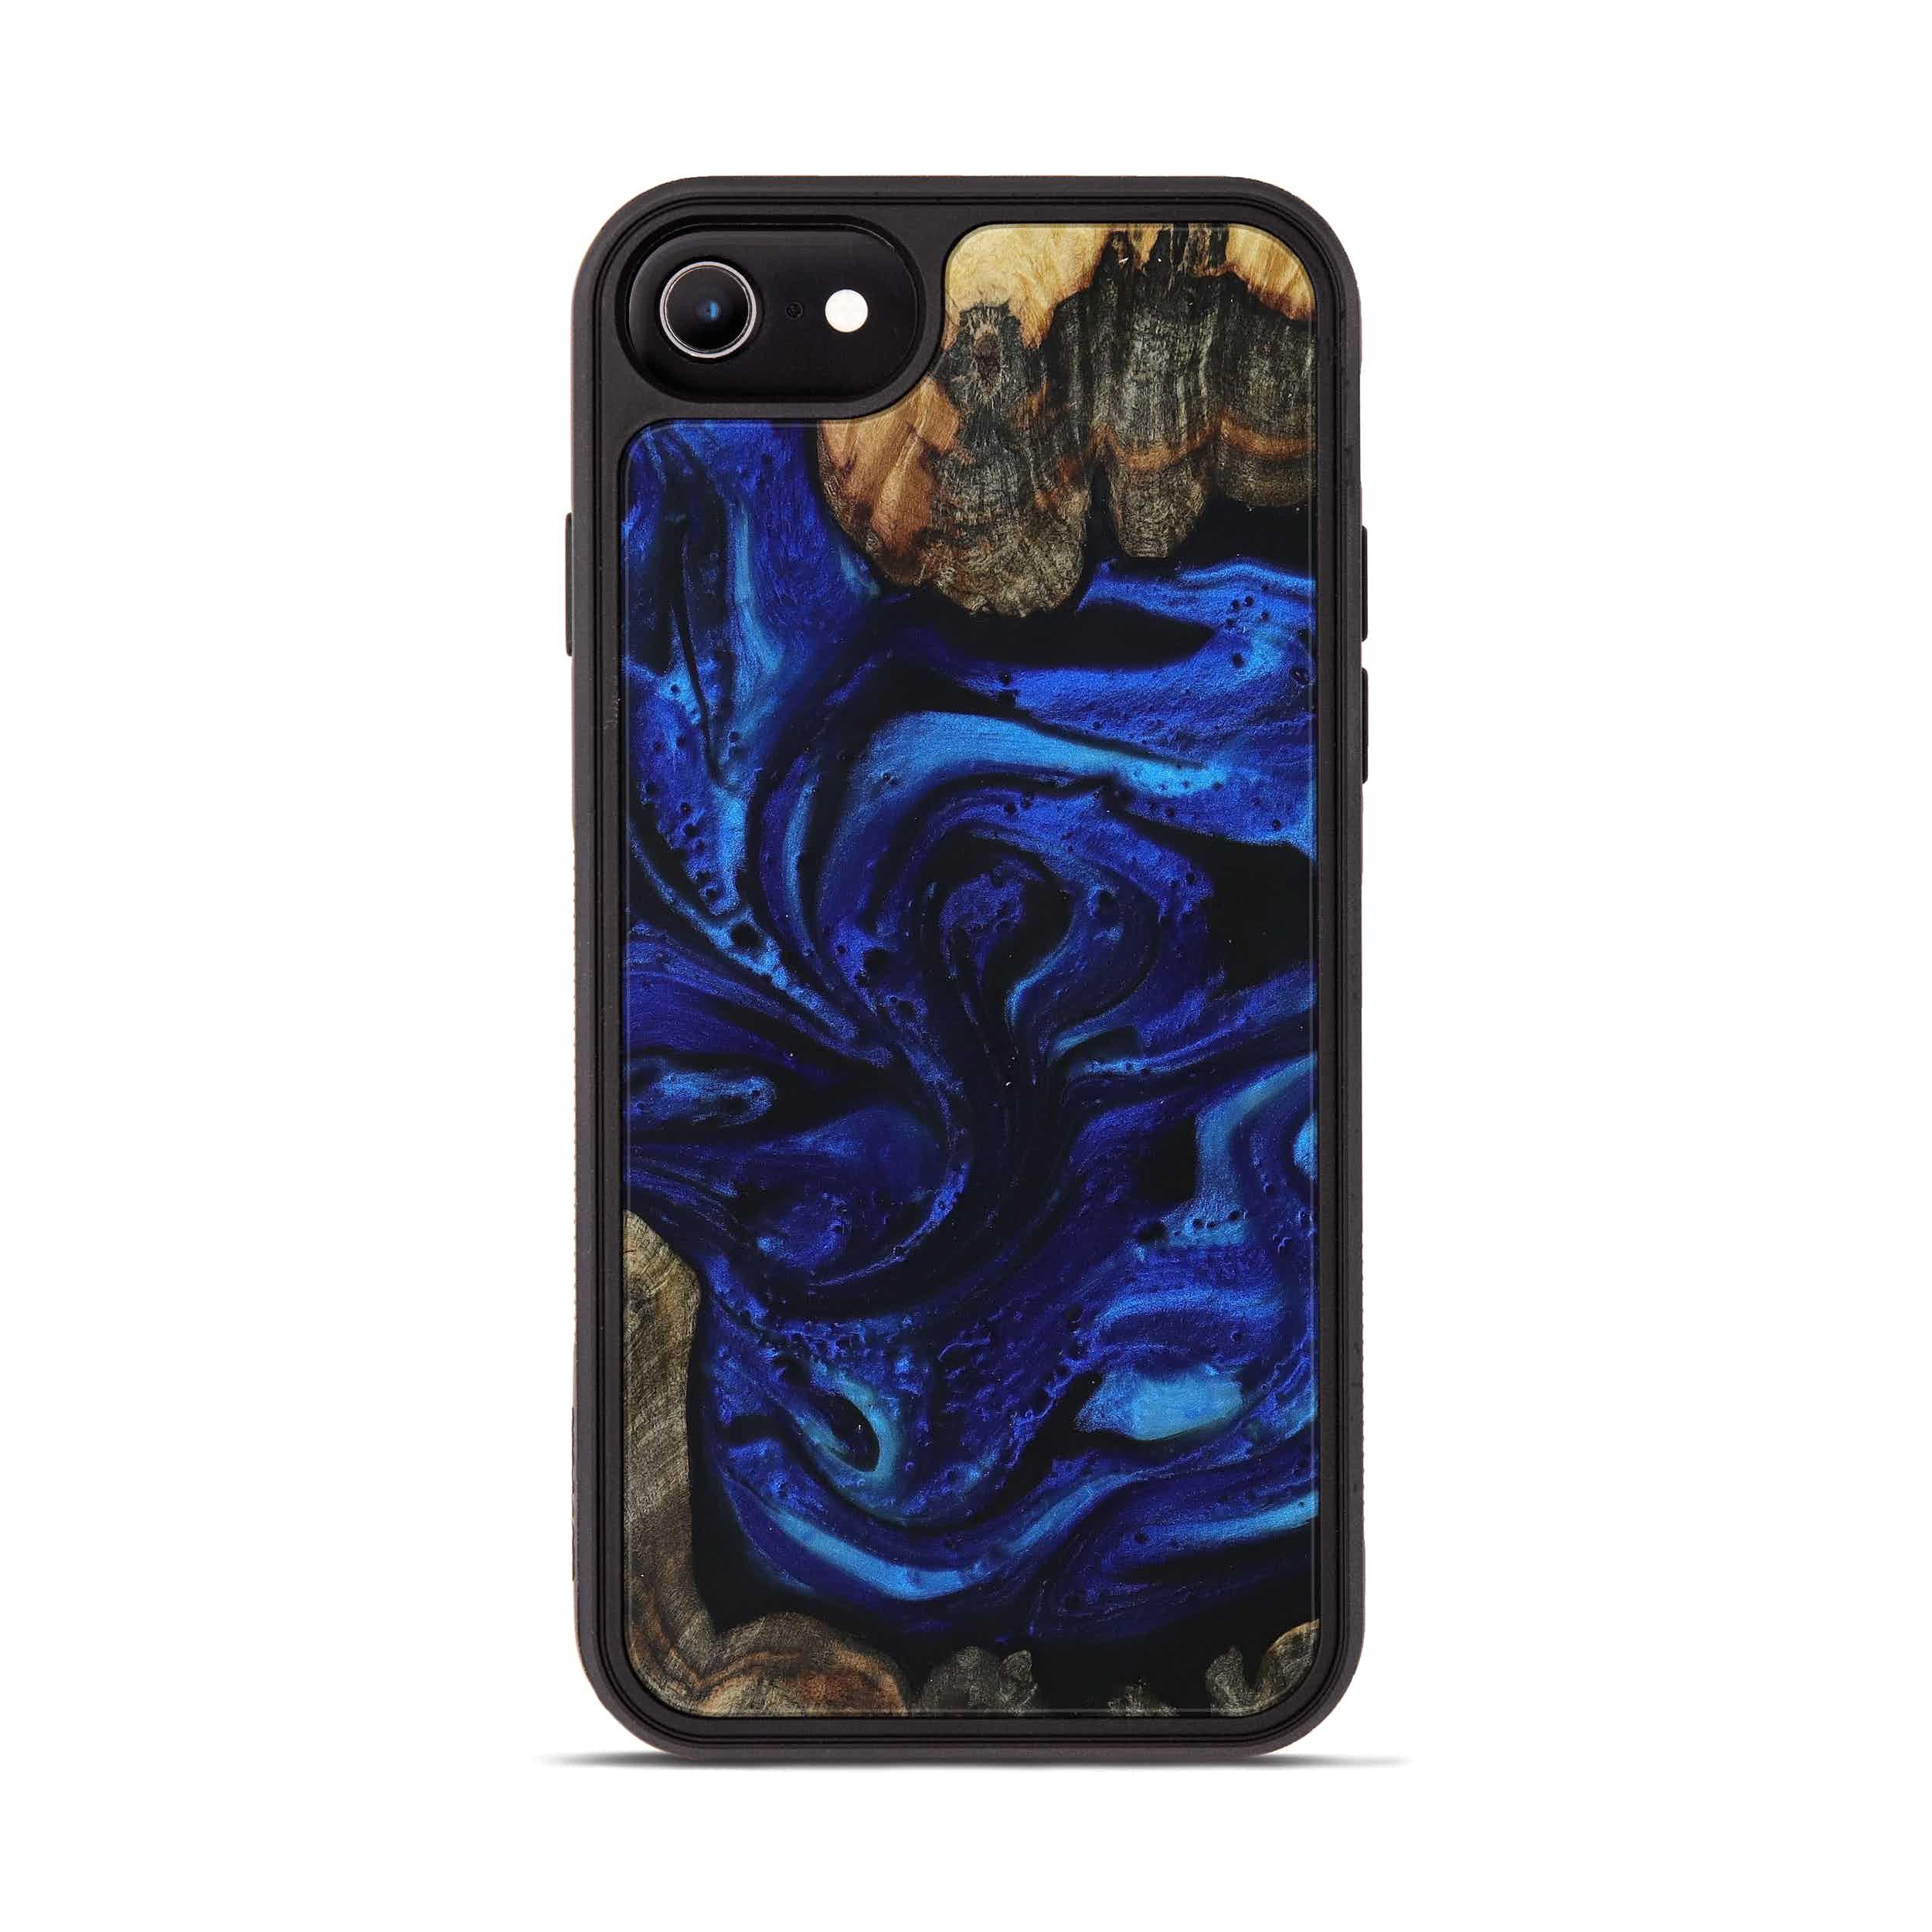 iPhone 7 Wood+Resin Phone Case - Tarrah (Dark Blue, 398824)